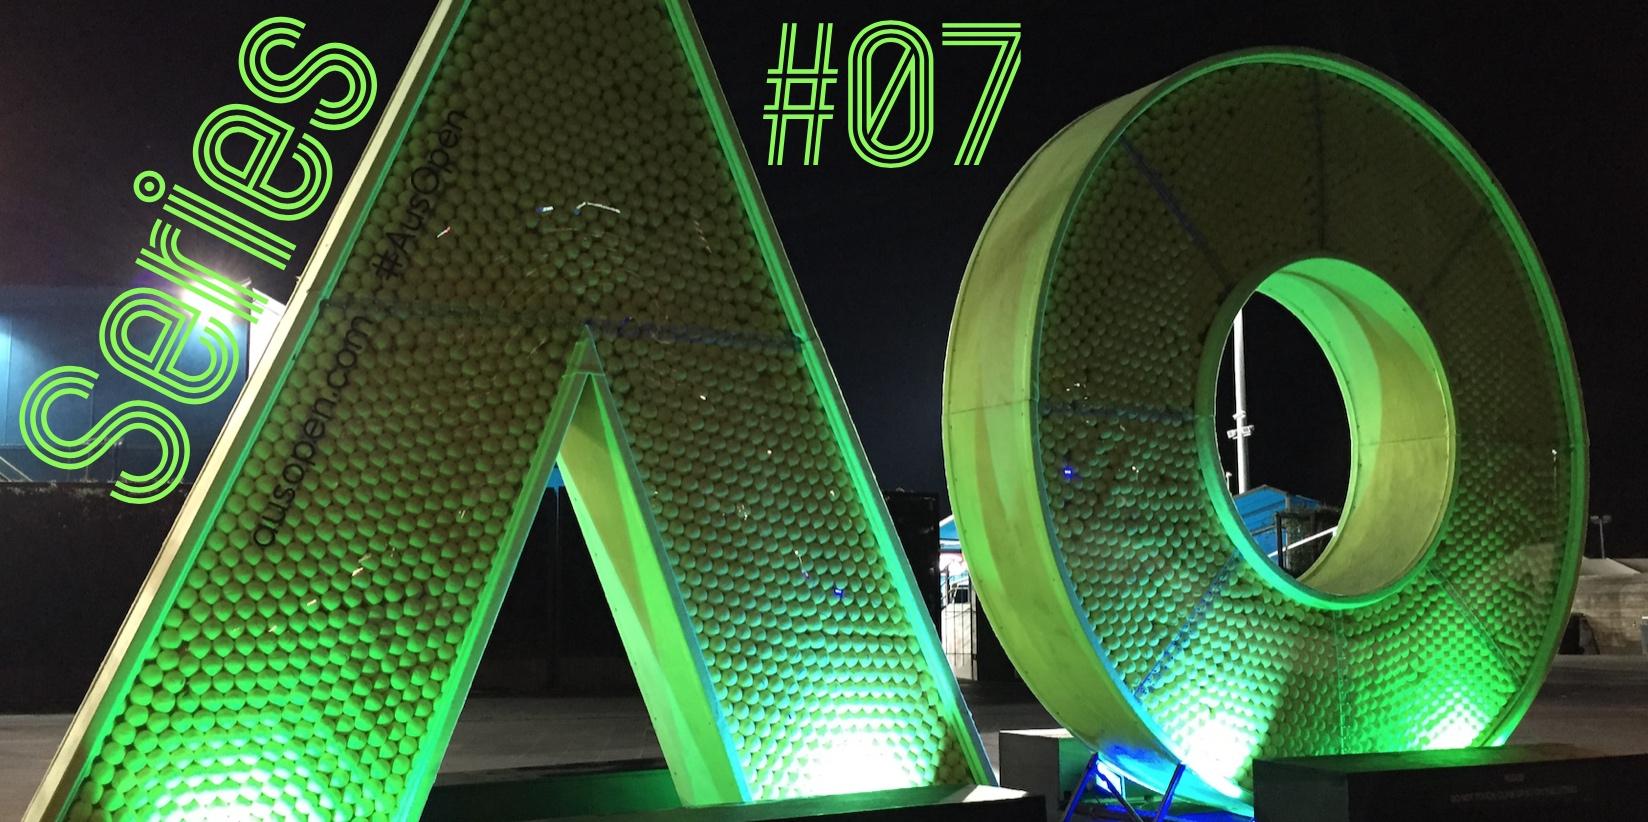 Australian Open Series #7 - settesei.it